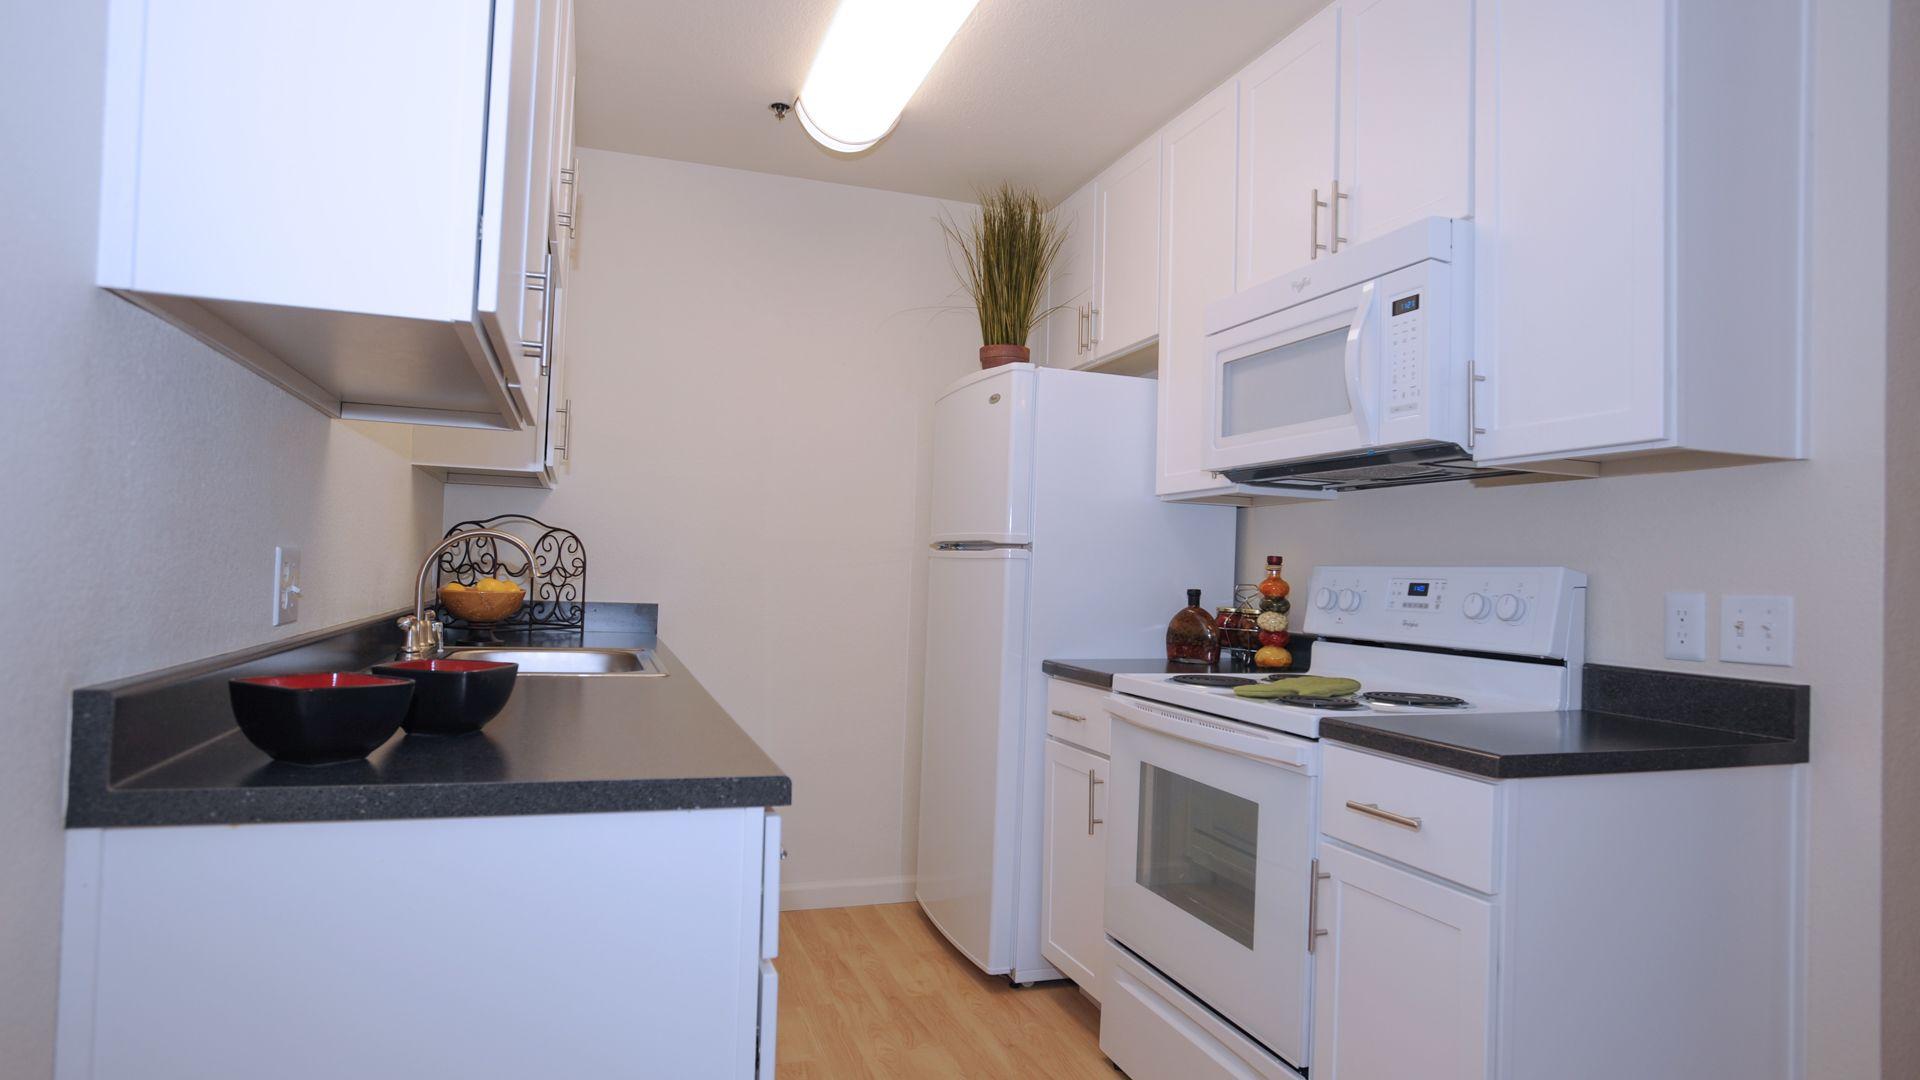 Briarwood Apartments - Kitchen